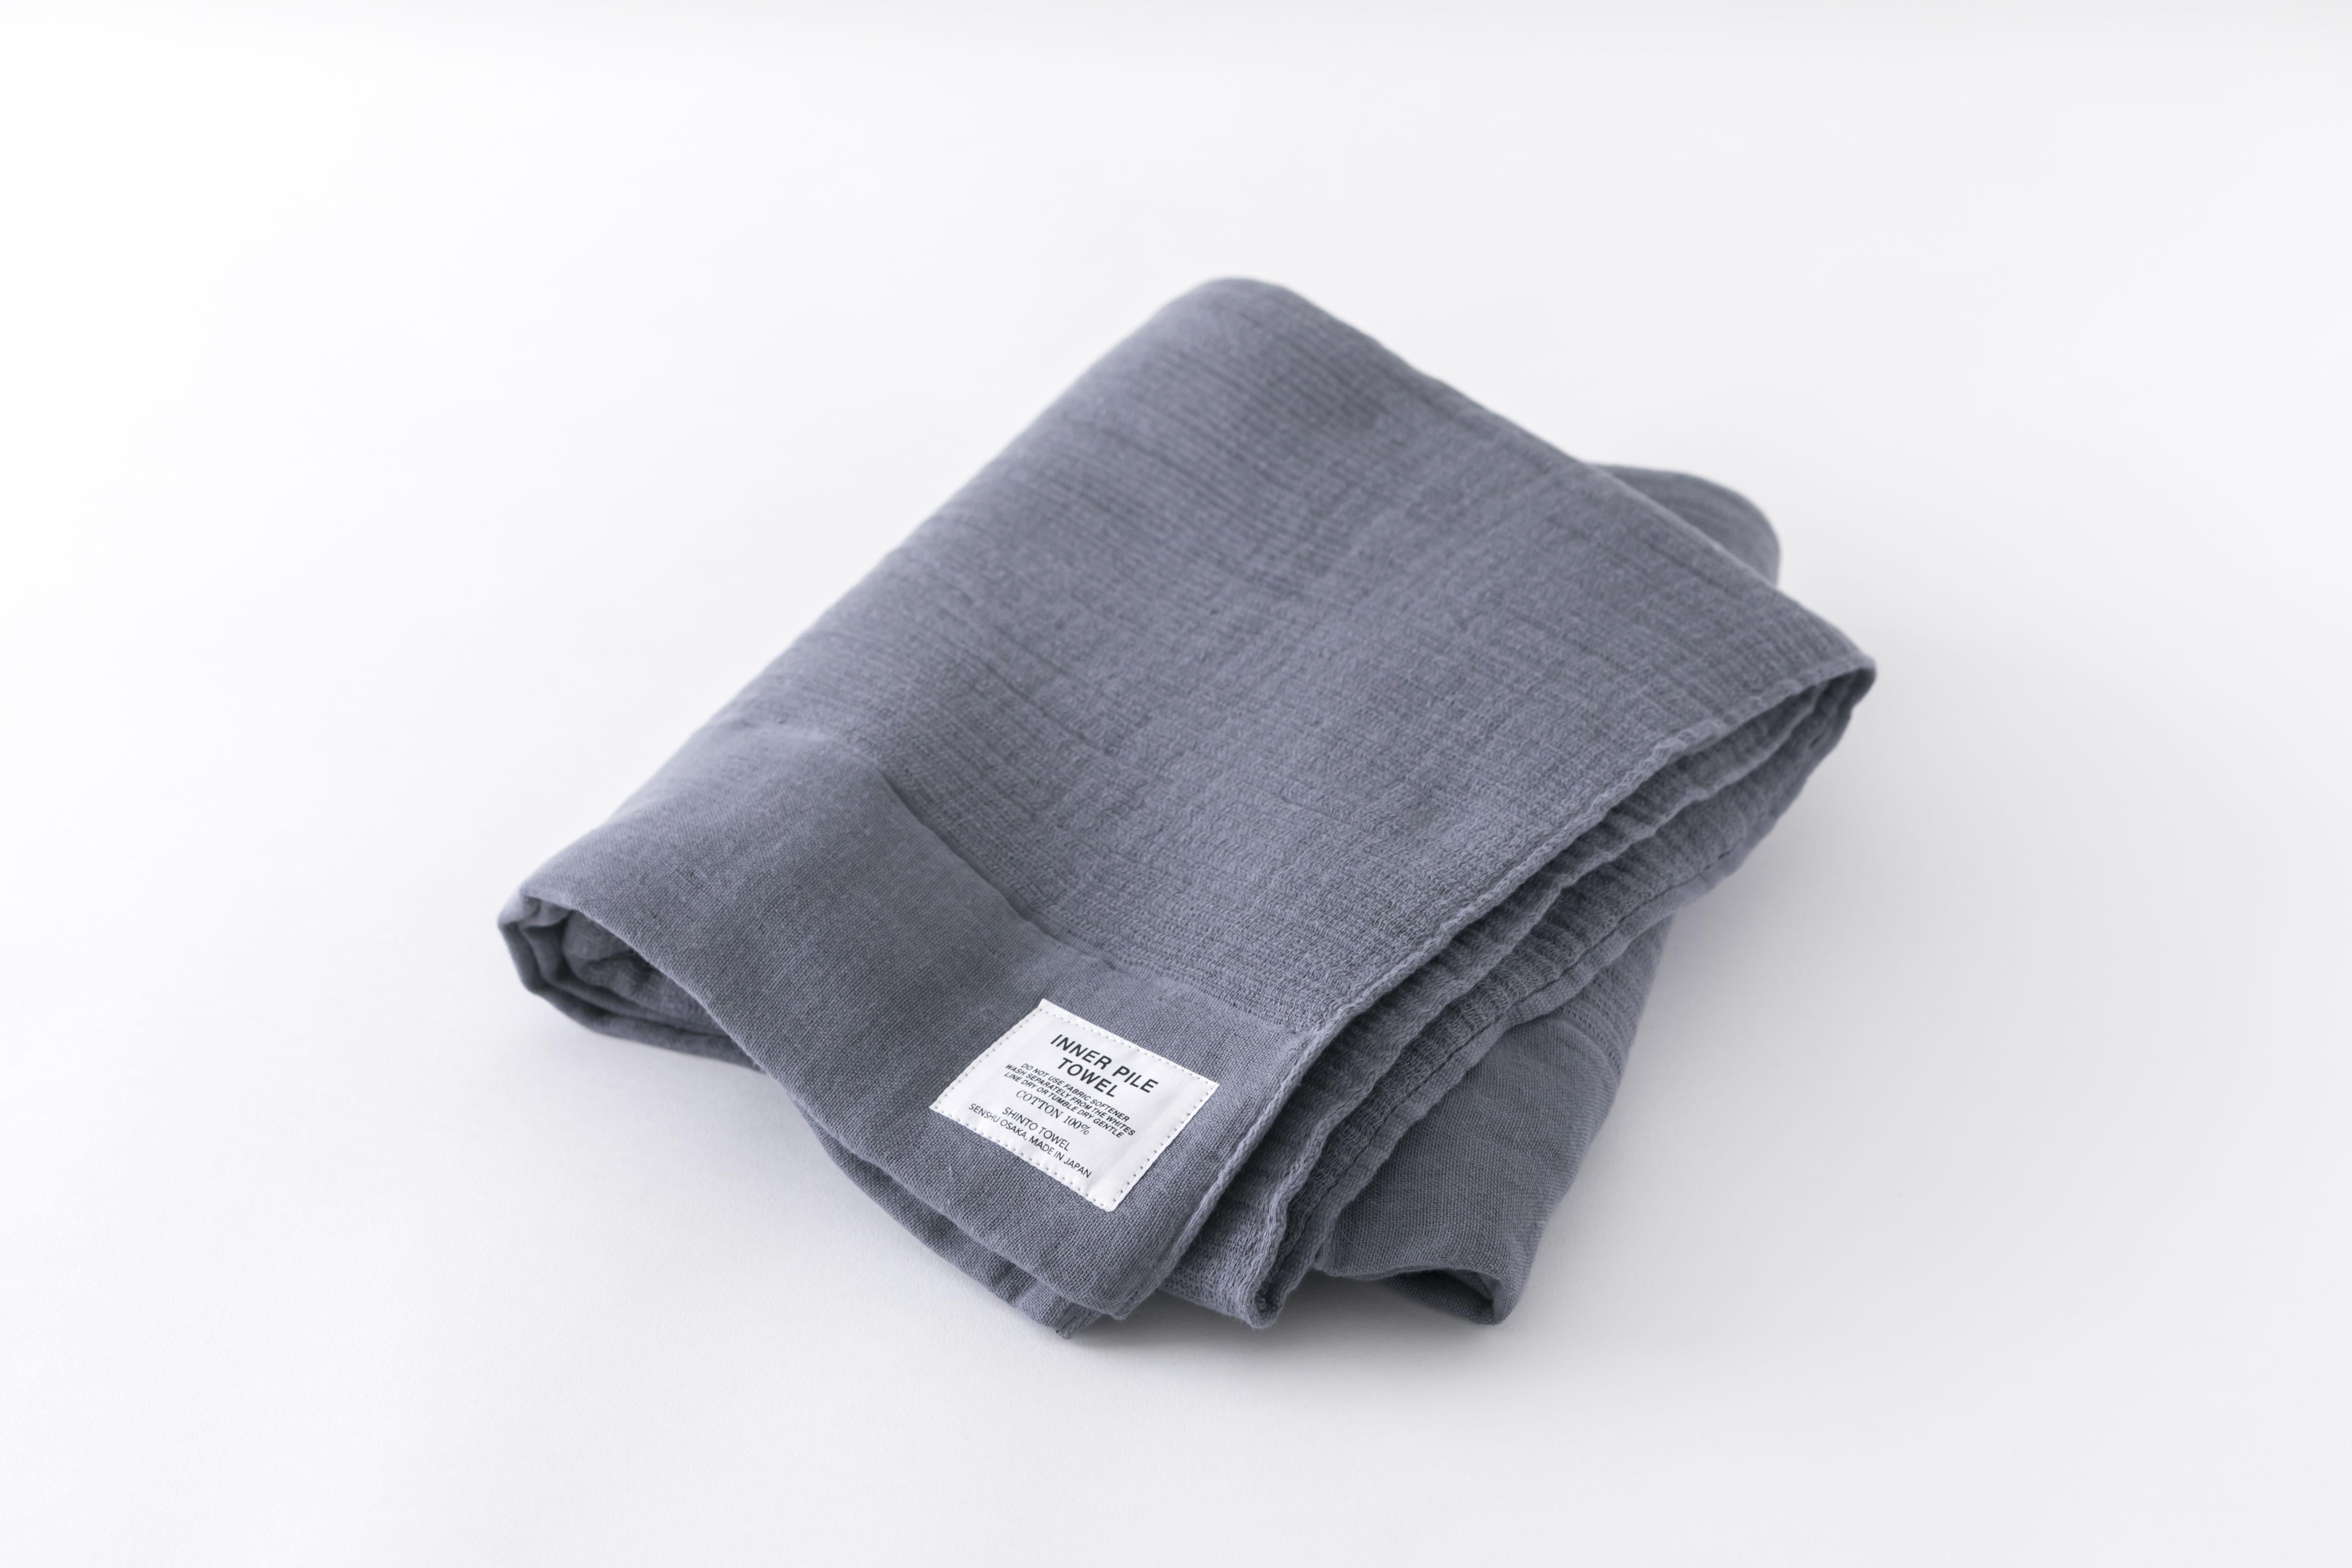 INNER PILE TOWEL : BATH TOWEL (Charcoal) / SHINTO TOWEL